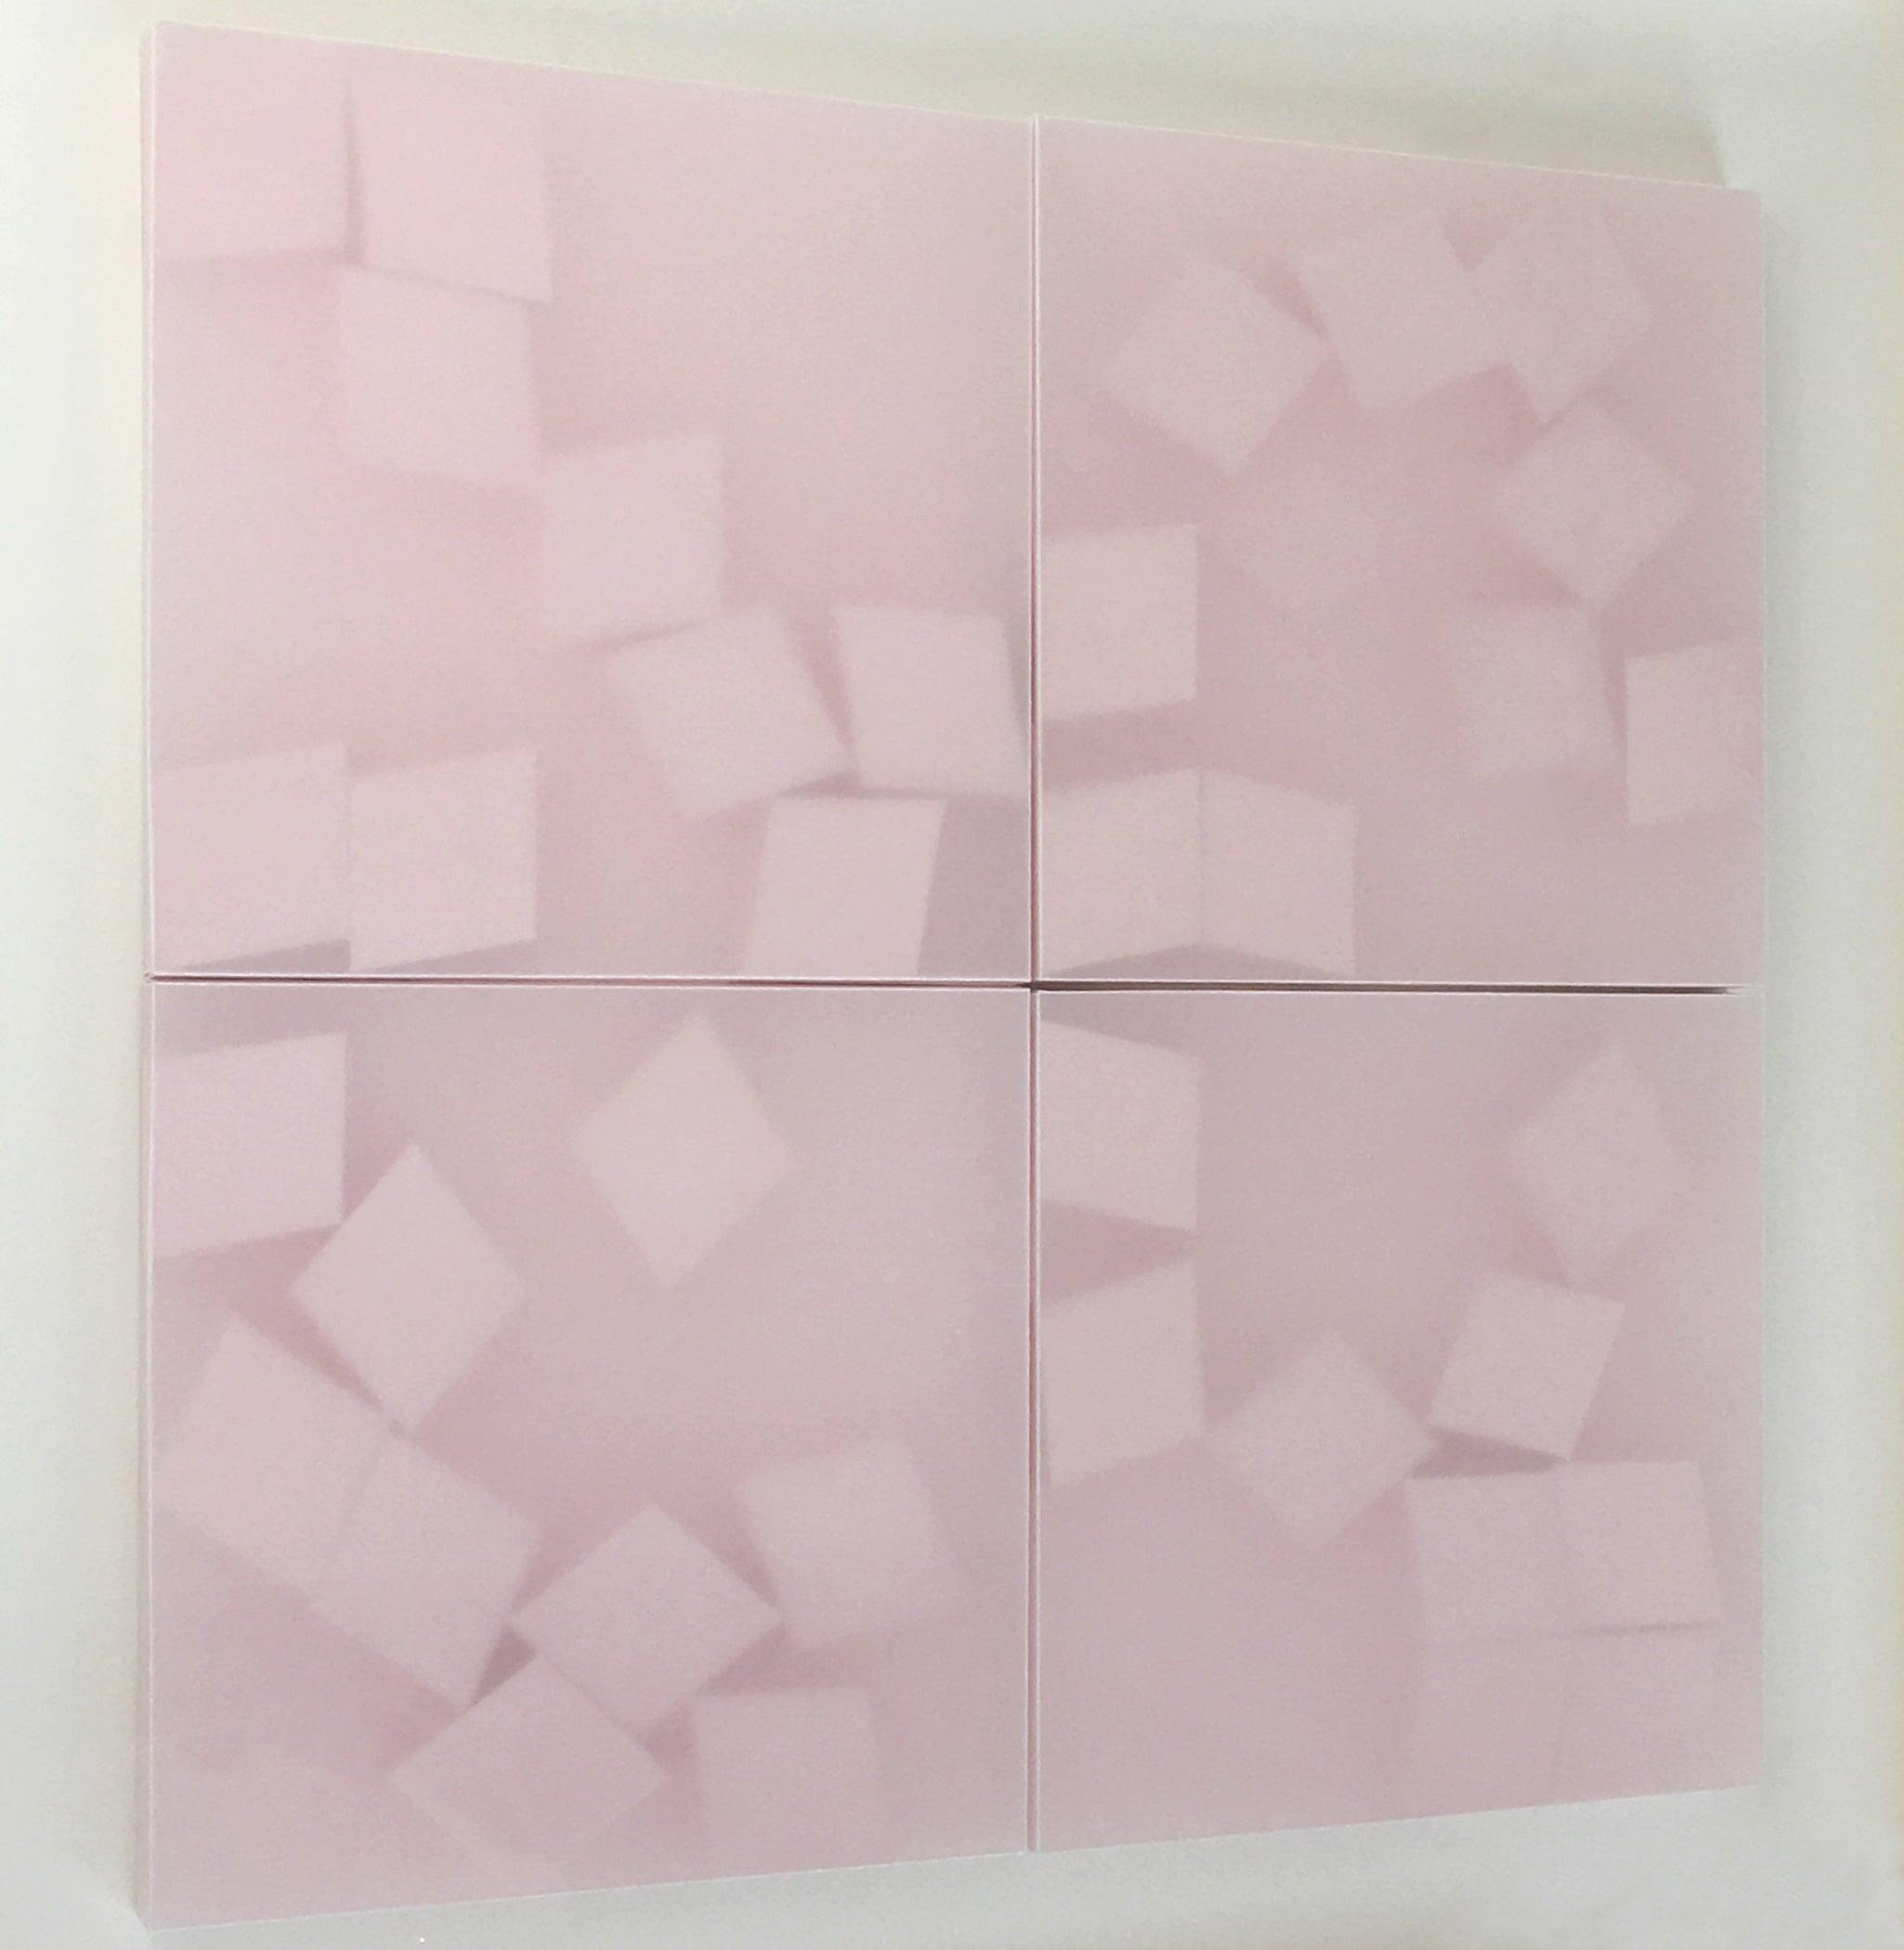 Norma Márquez Orozco, Pink Diamonds, 2015 Translucent Paper, 25 x 25, Minimalist